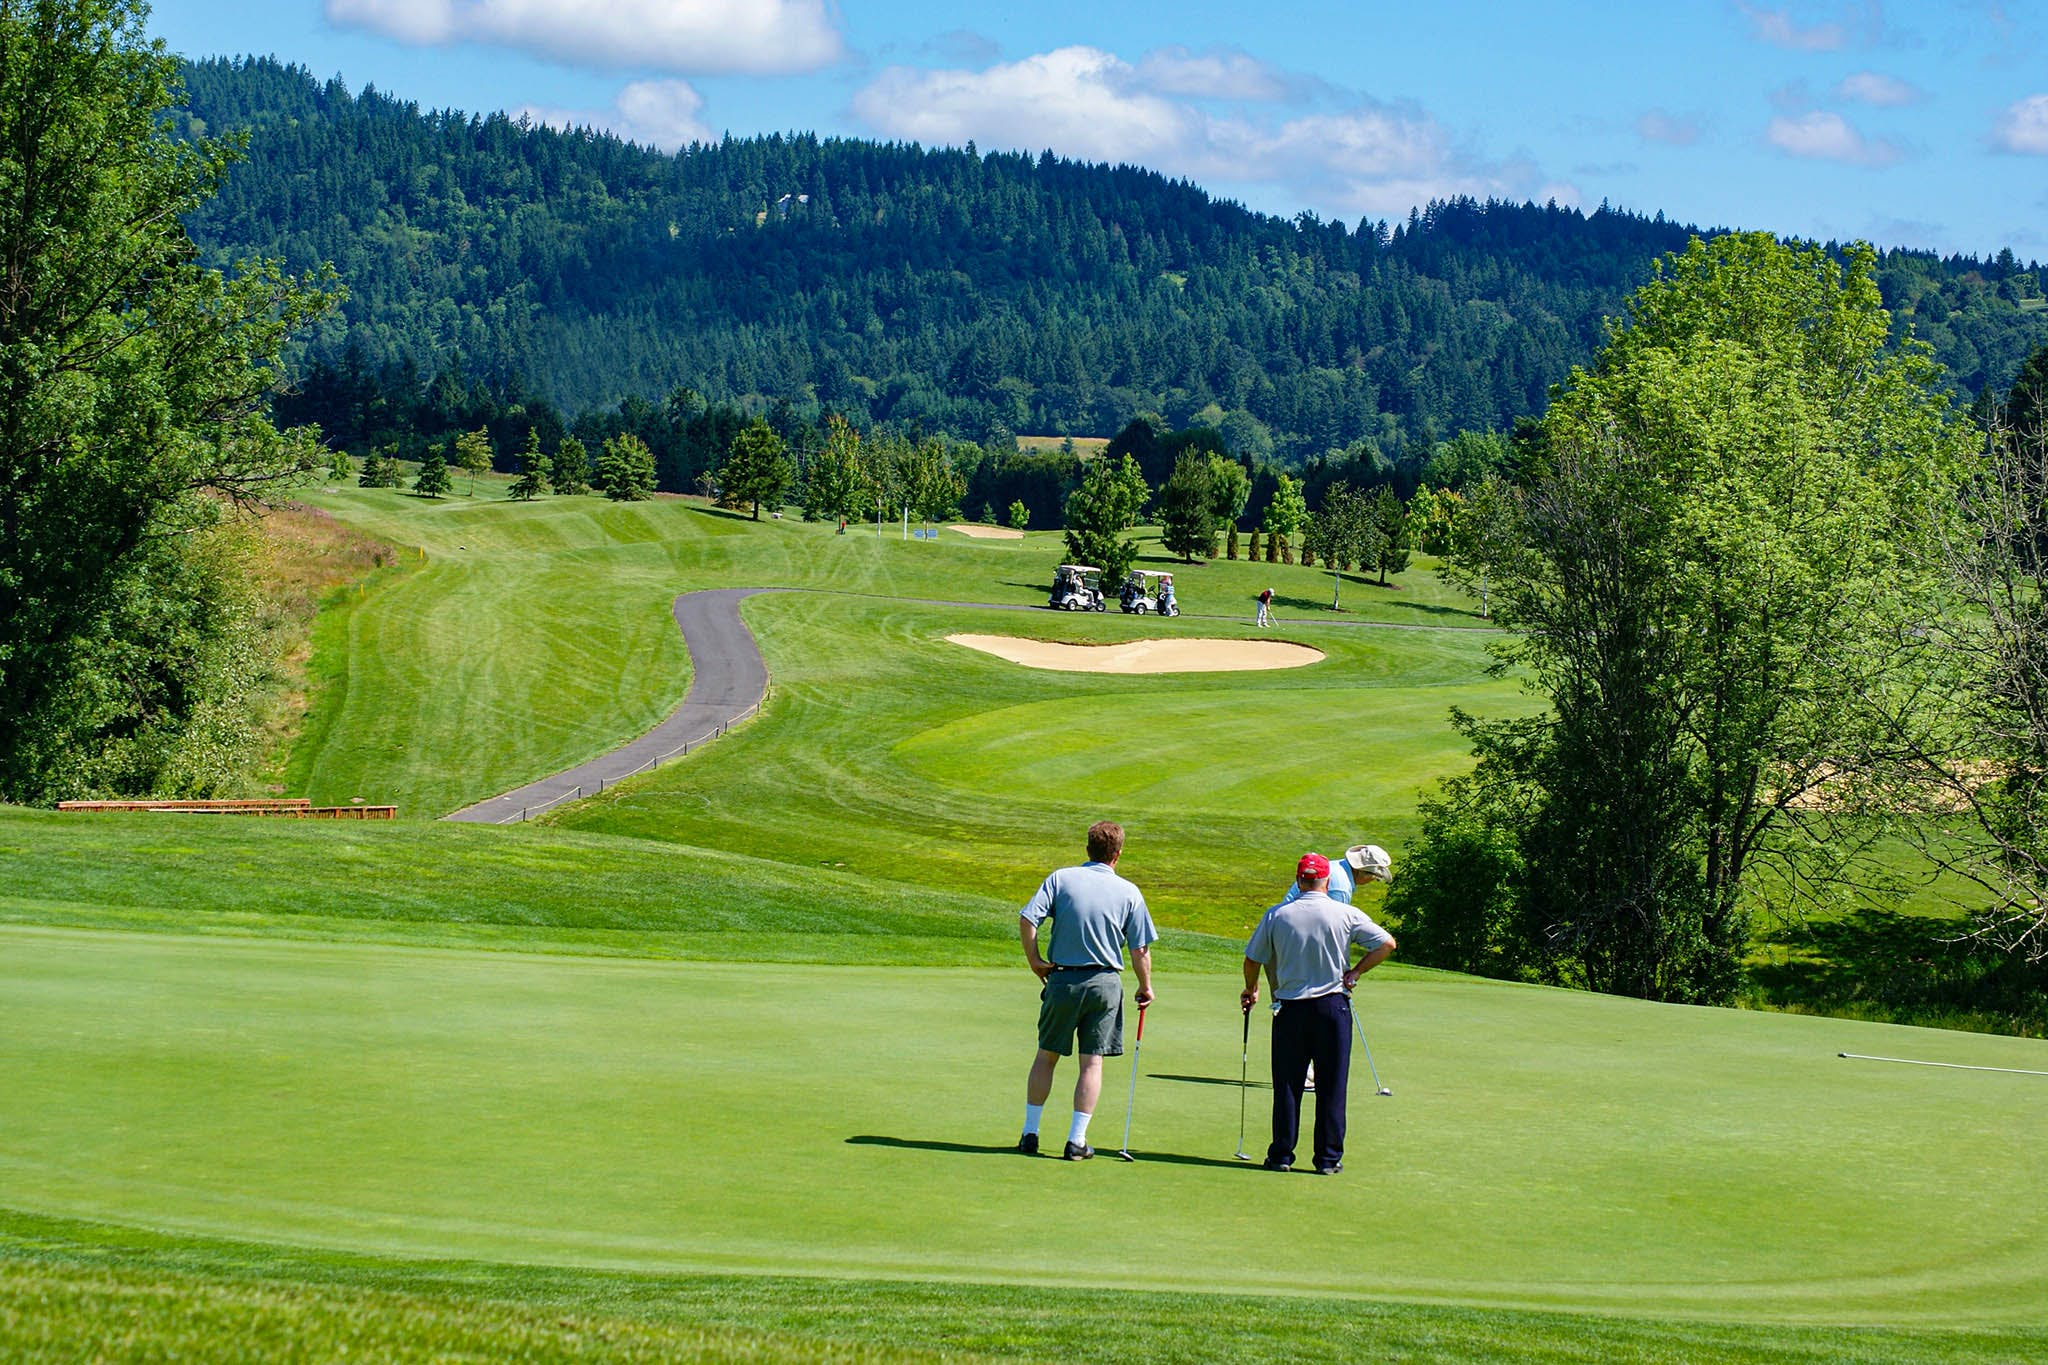 Golfing at Chehalem Glenn Golf Course